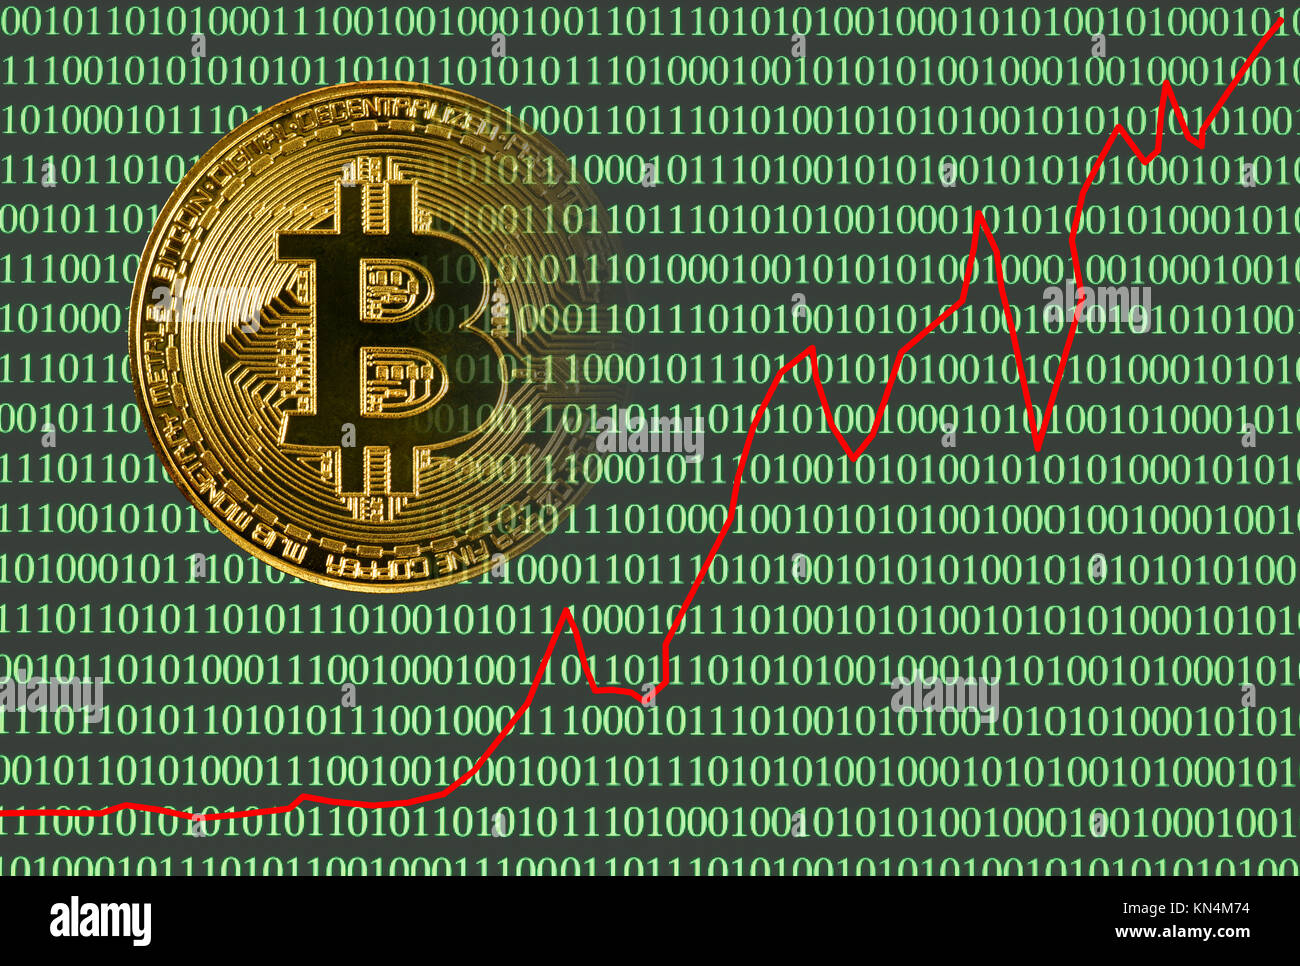 Symbol Bild handeln Kurs digitale Währung, goldene physischen Münze bitcoin Laptop mit binären Code Stockbild